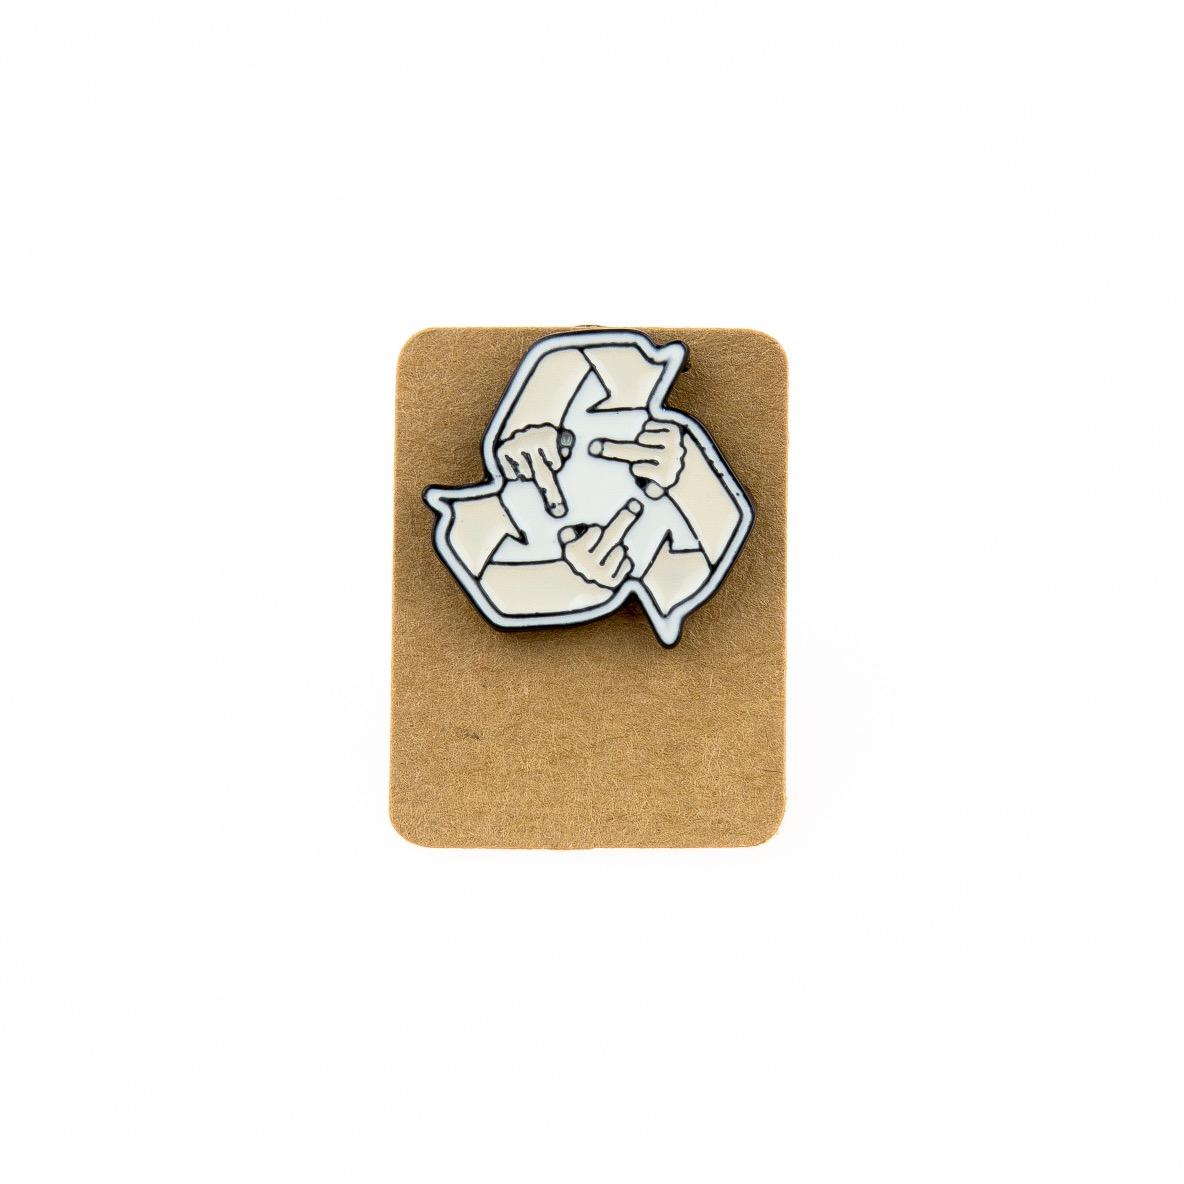 Metal Recycled Middle Finger Enamel Pin Badge